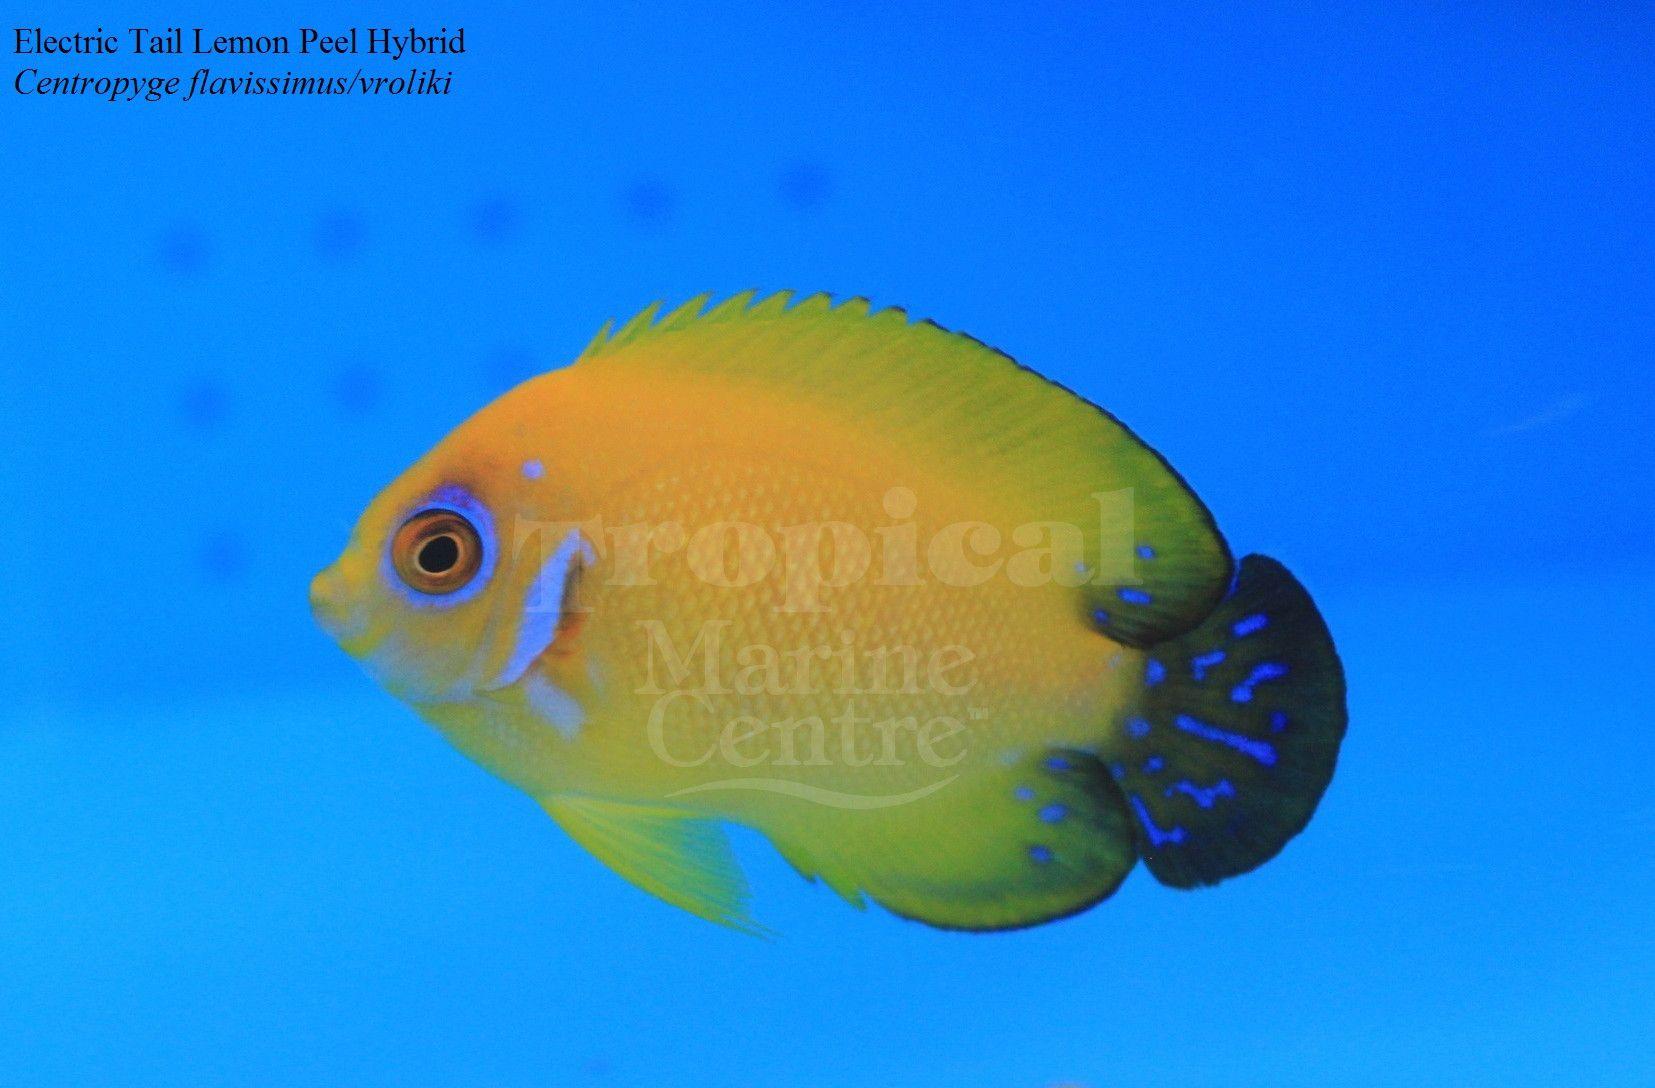 Electric Tail Lemon Peel Angelfish Hybrid C Flavissima And C Vroliki A Electric Tail Lemon Peel Angelfish Marine Fish Saltwater Aquarium Aquarium Fish